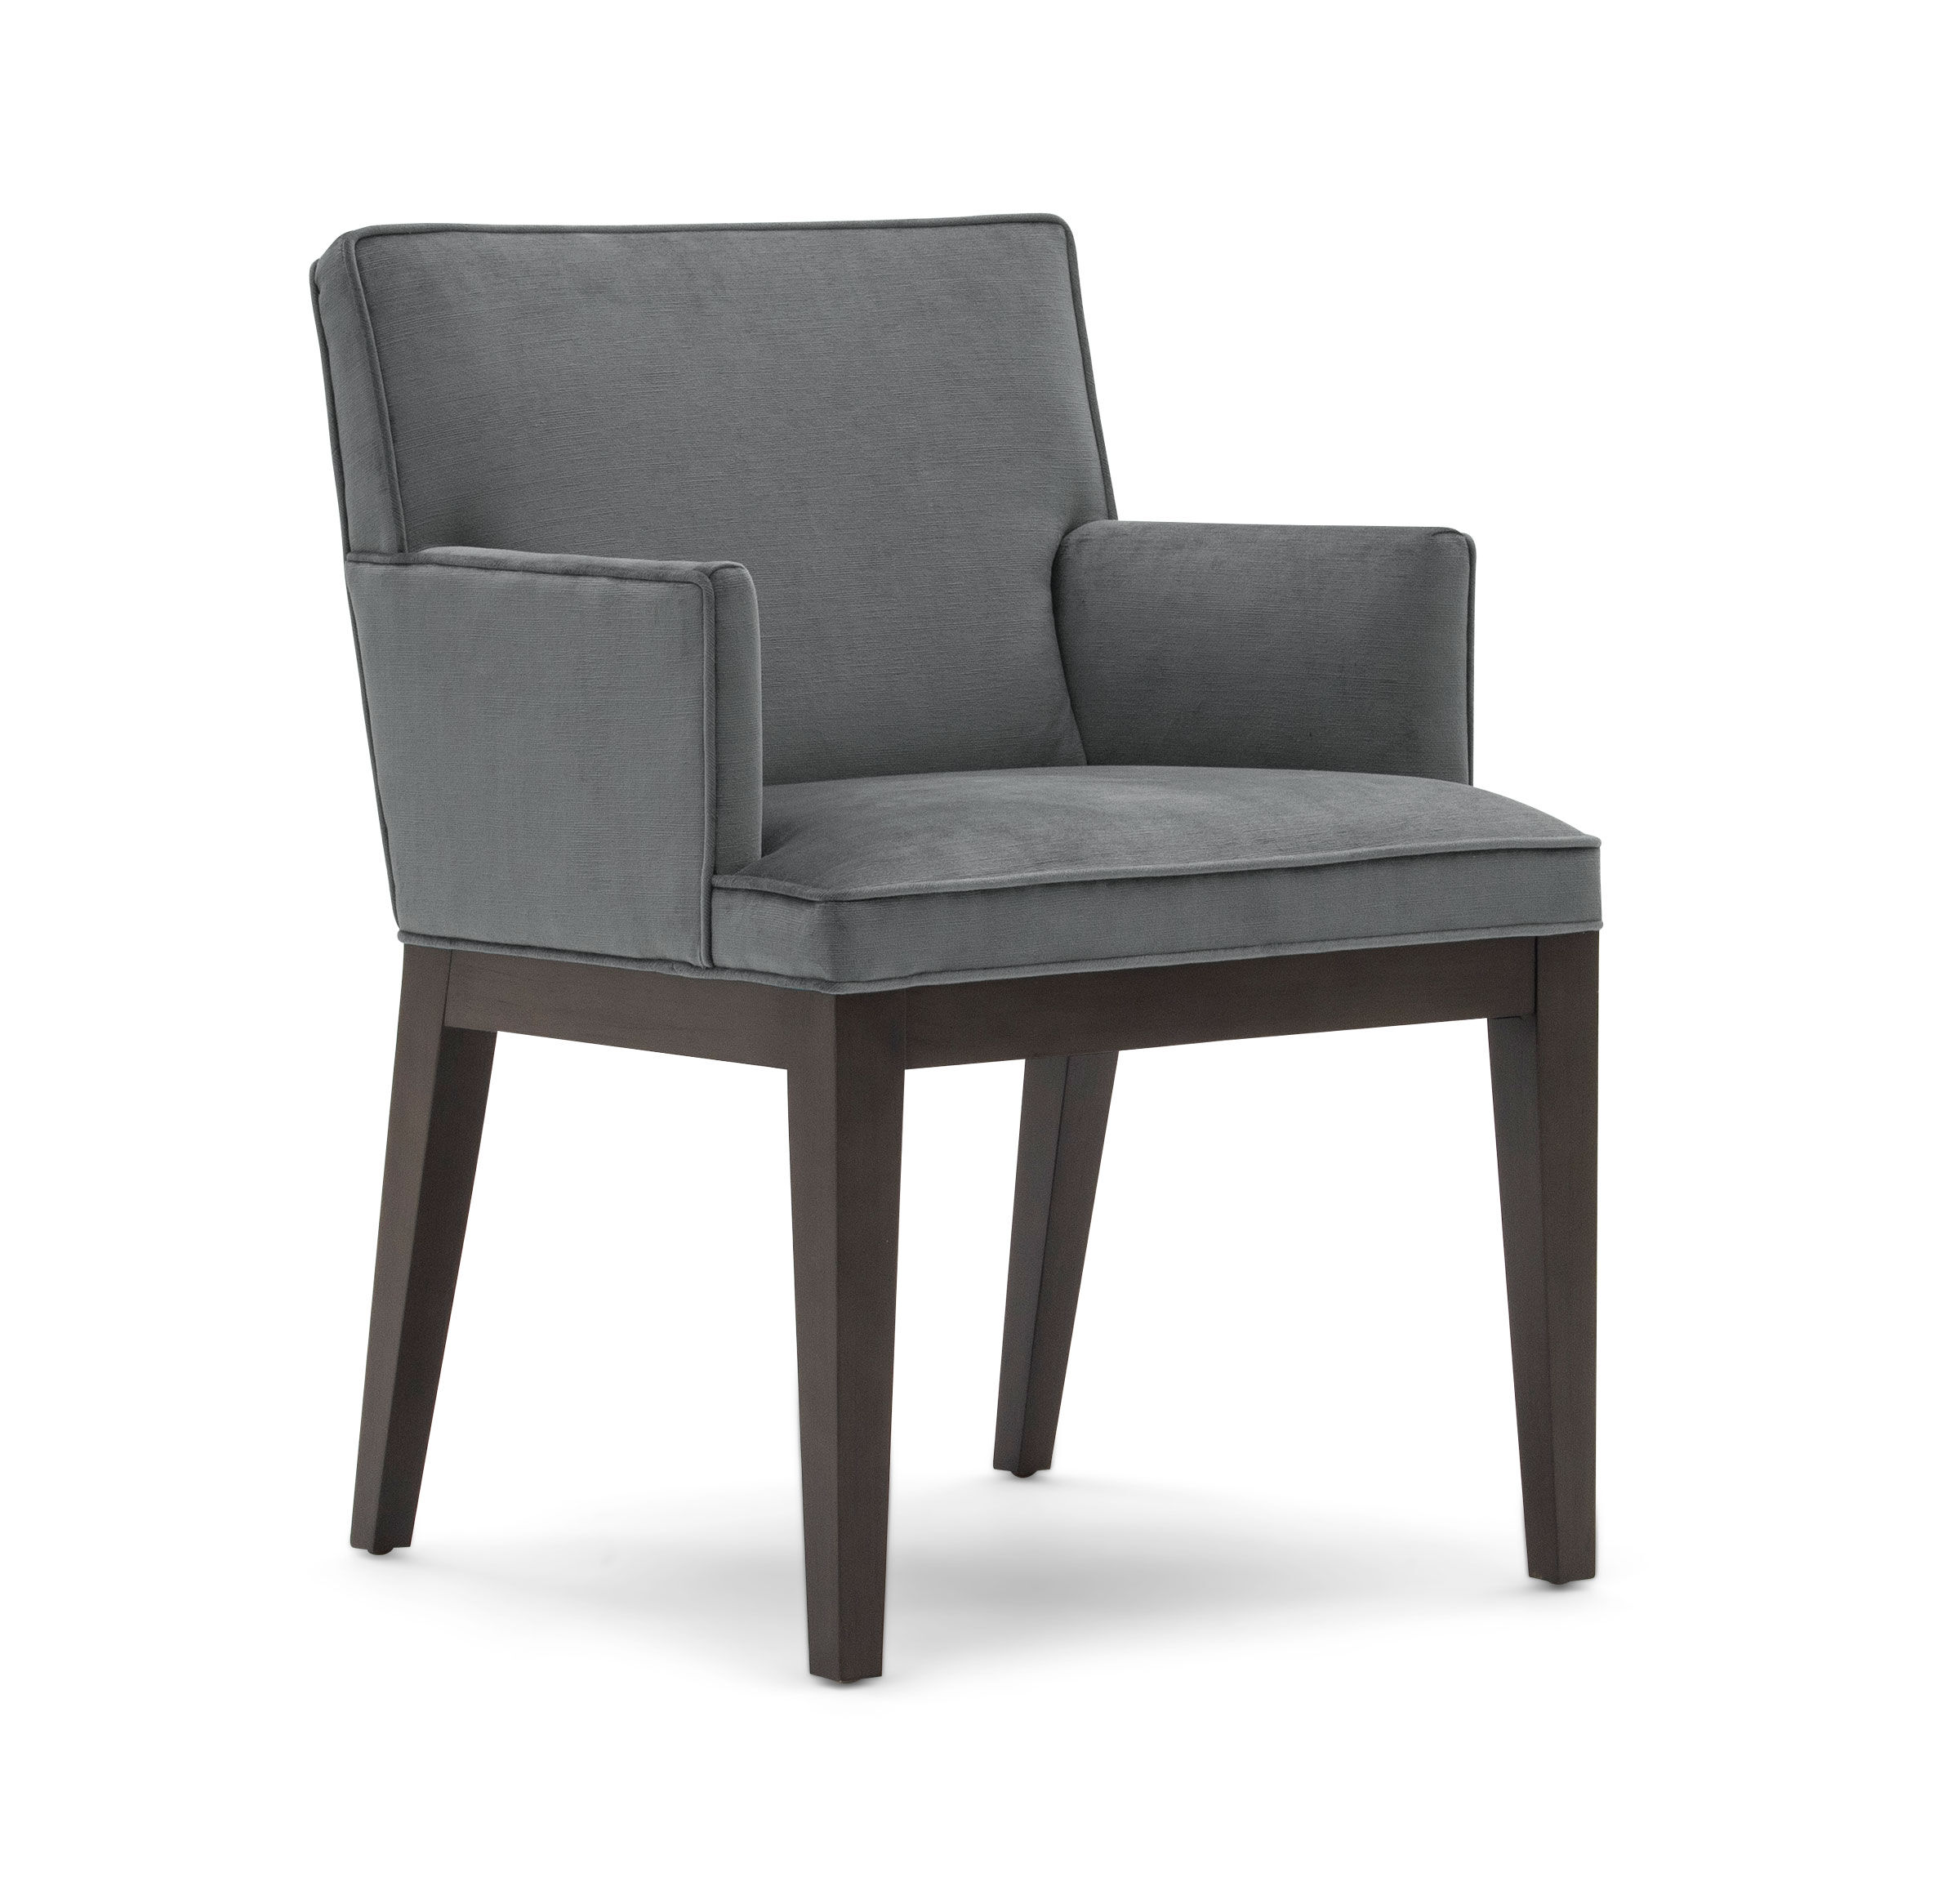 Cameron Arm Dining Chair